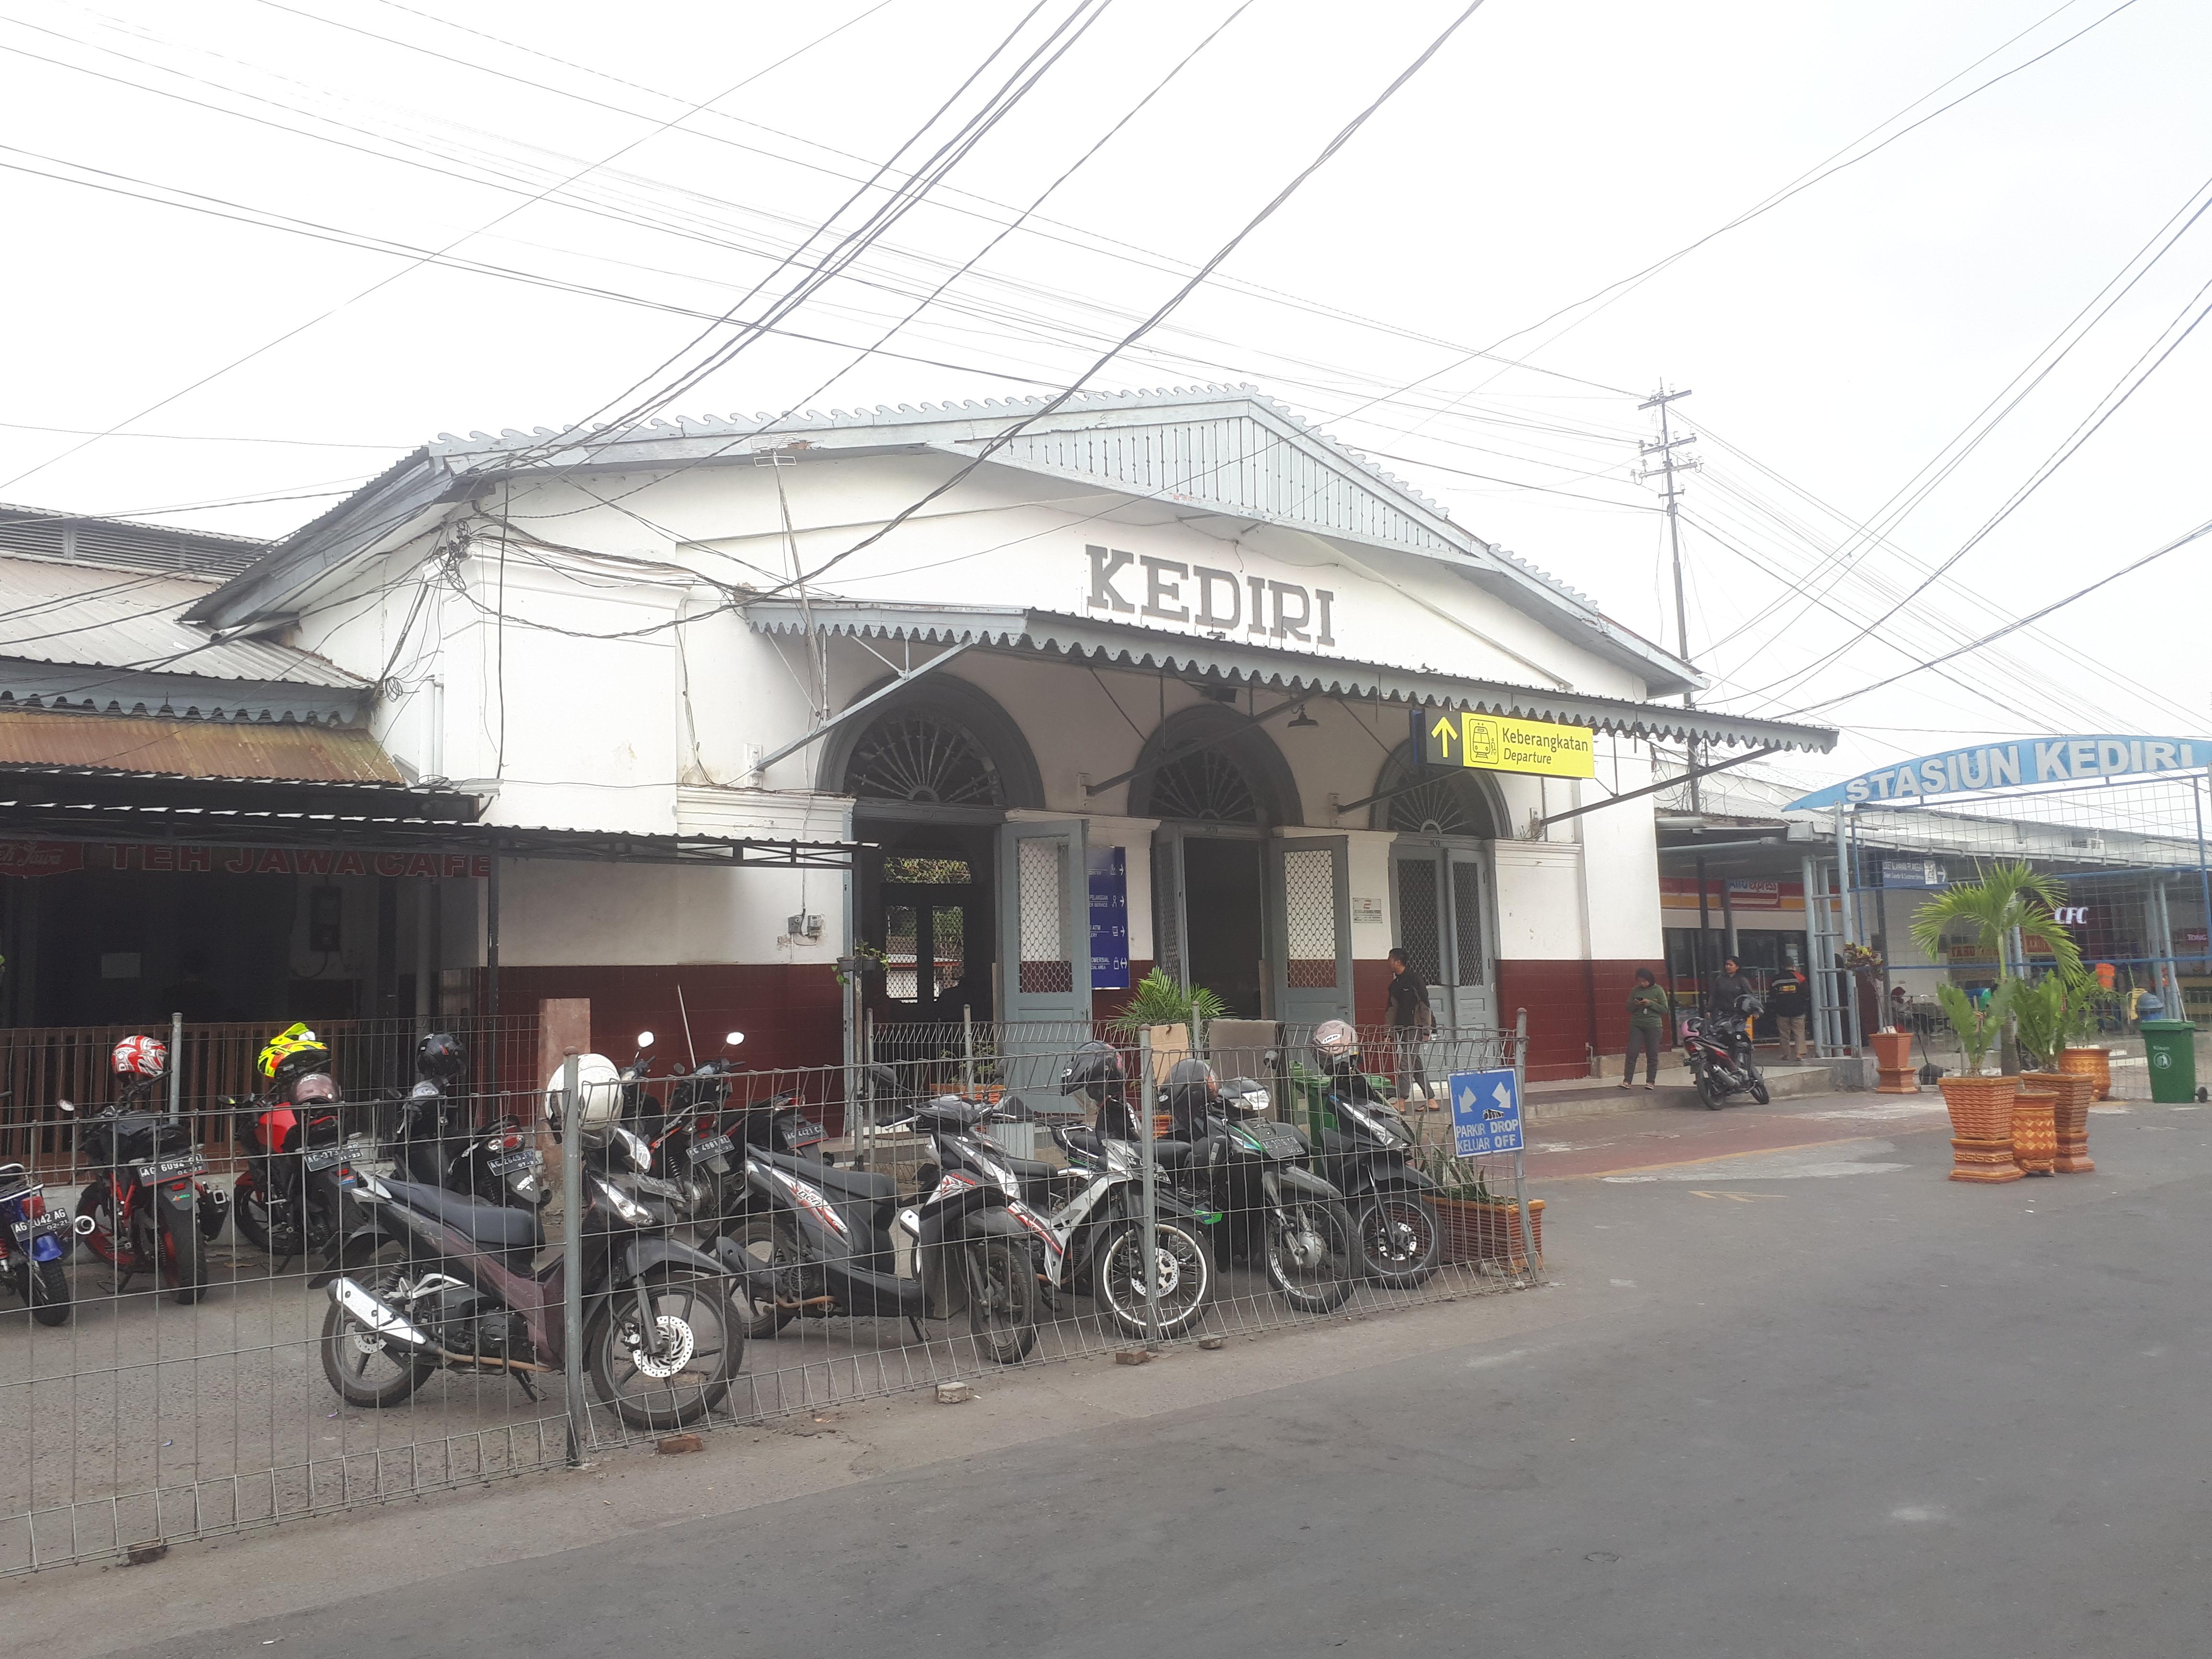 Met Parking Services >> Stasiun Kediri Wikipedia Bahasa Indonesia Ensiklopedia Bebas